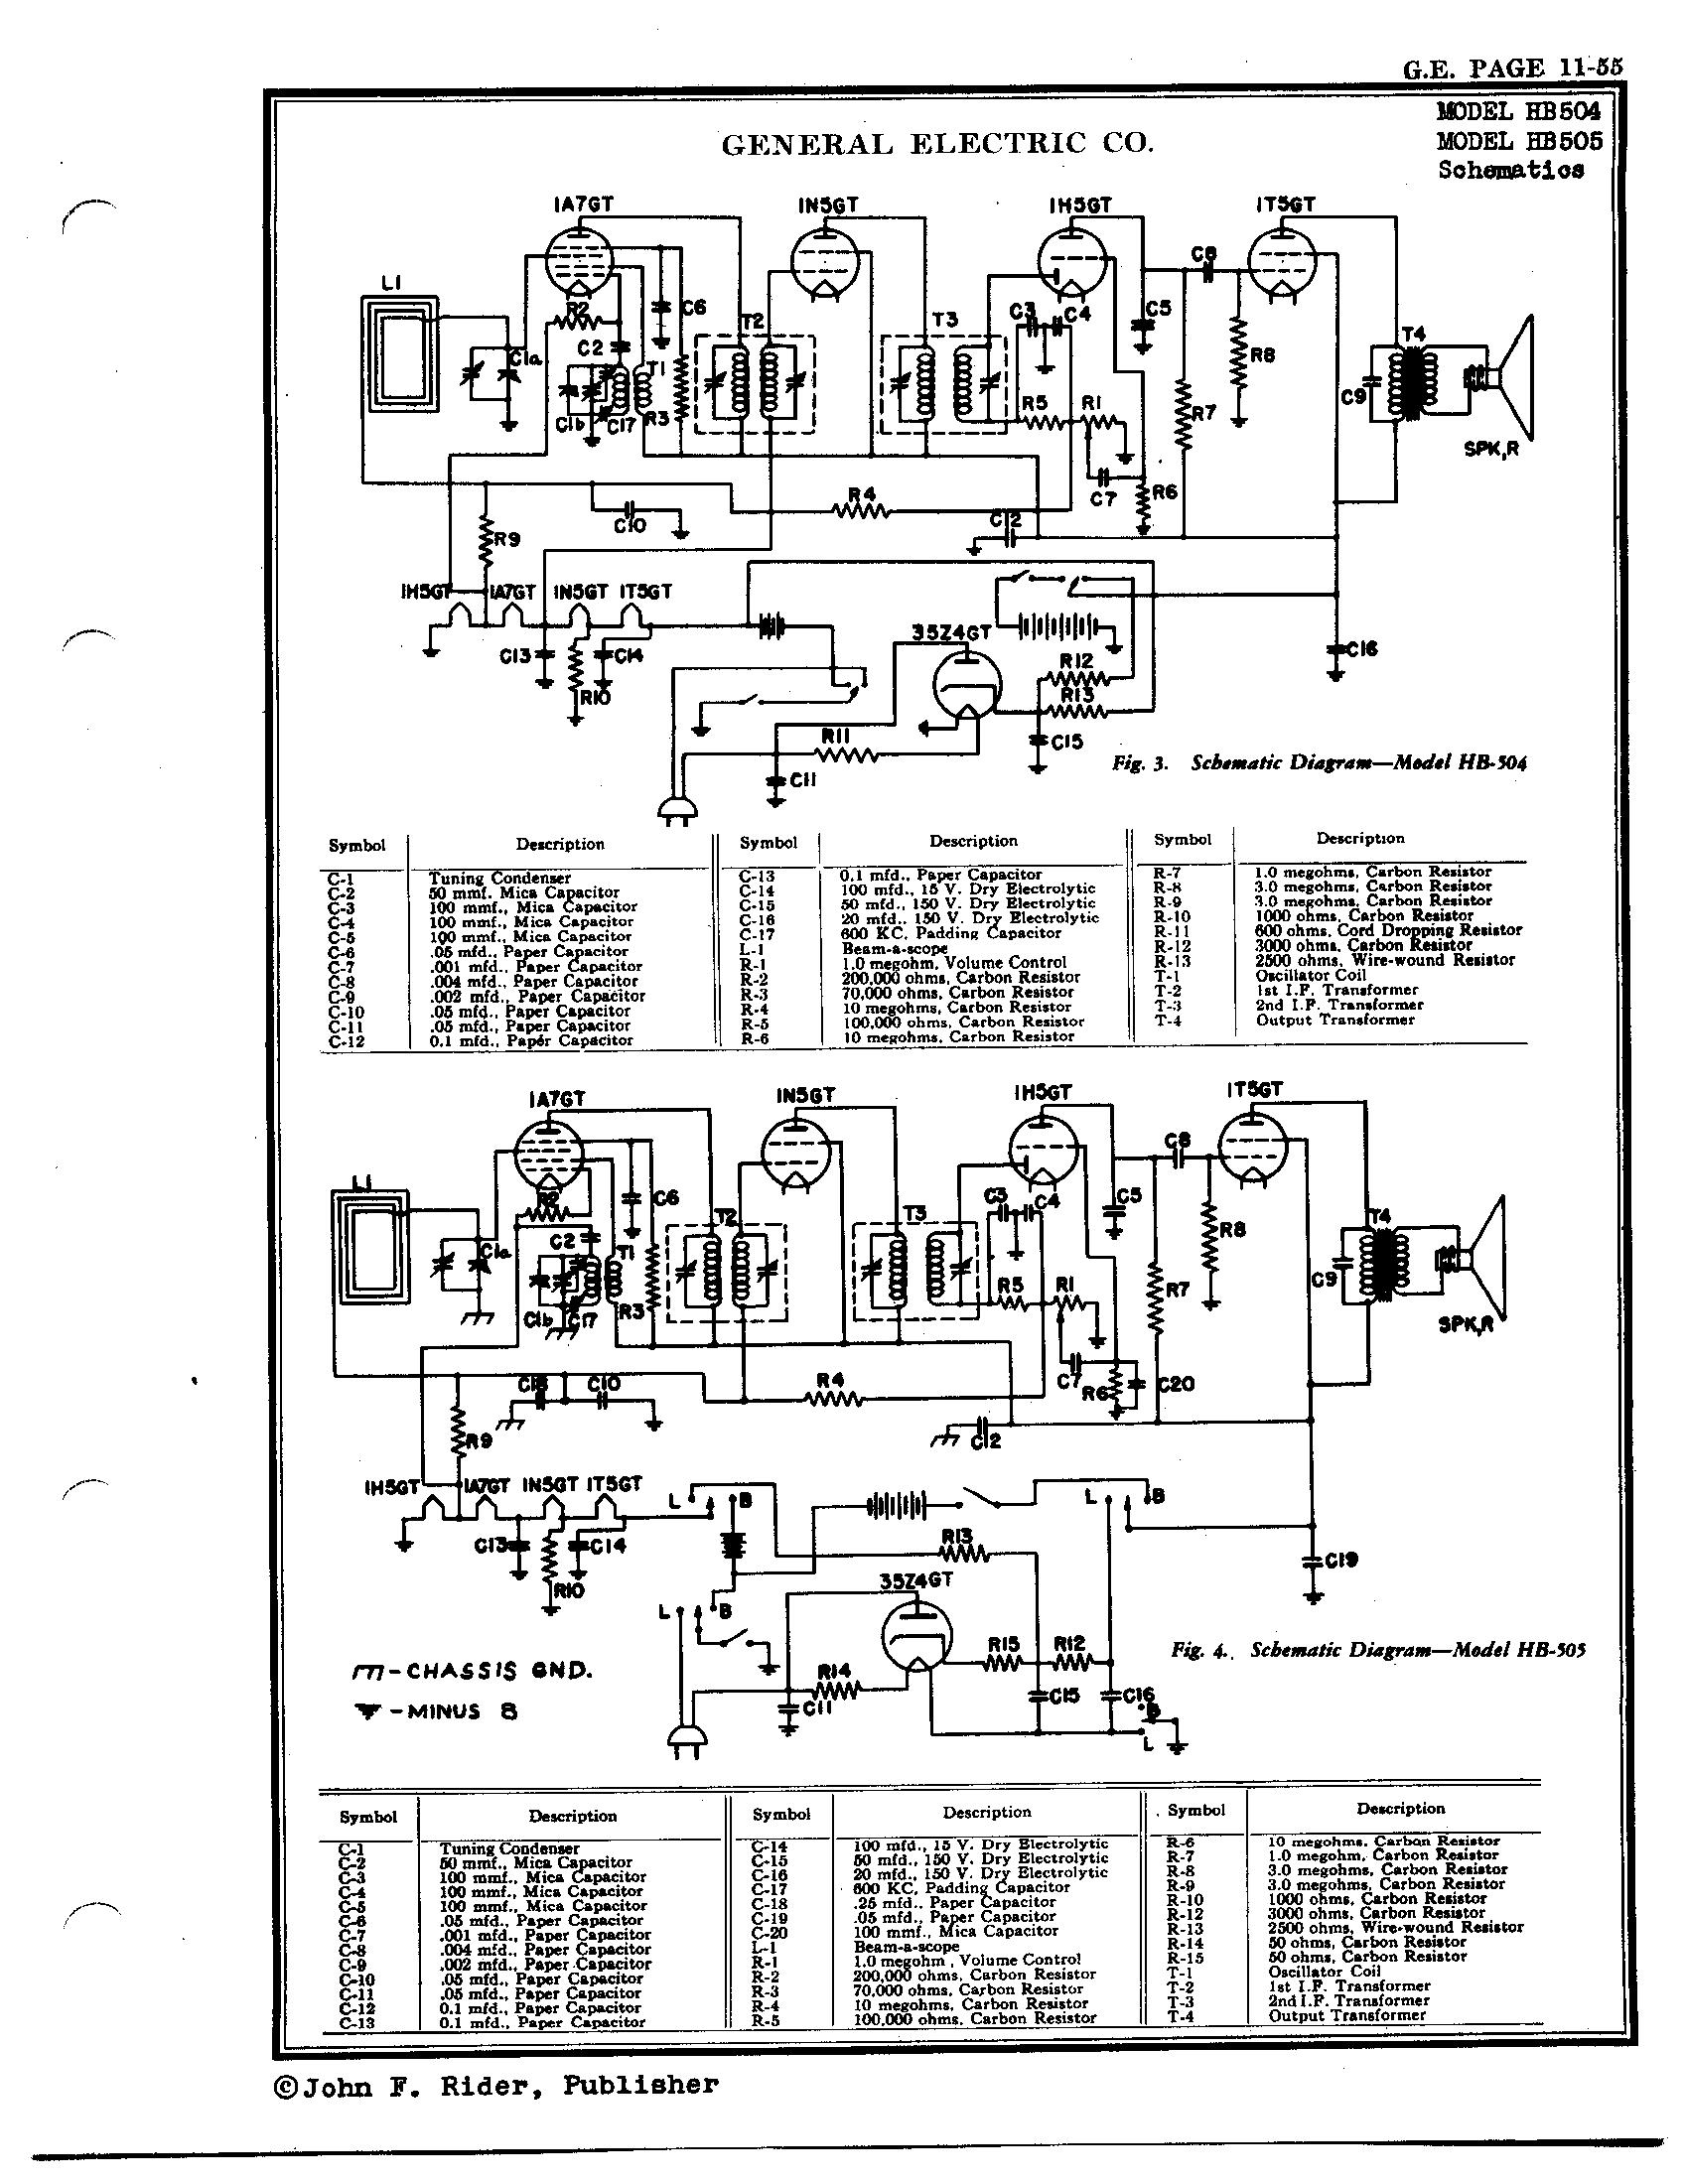 Perfect Symbol Electric Ensign - Wiring Diagram Ideas - guapodugh.com